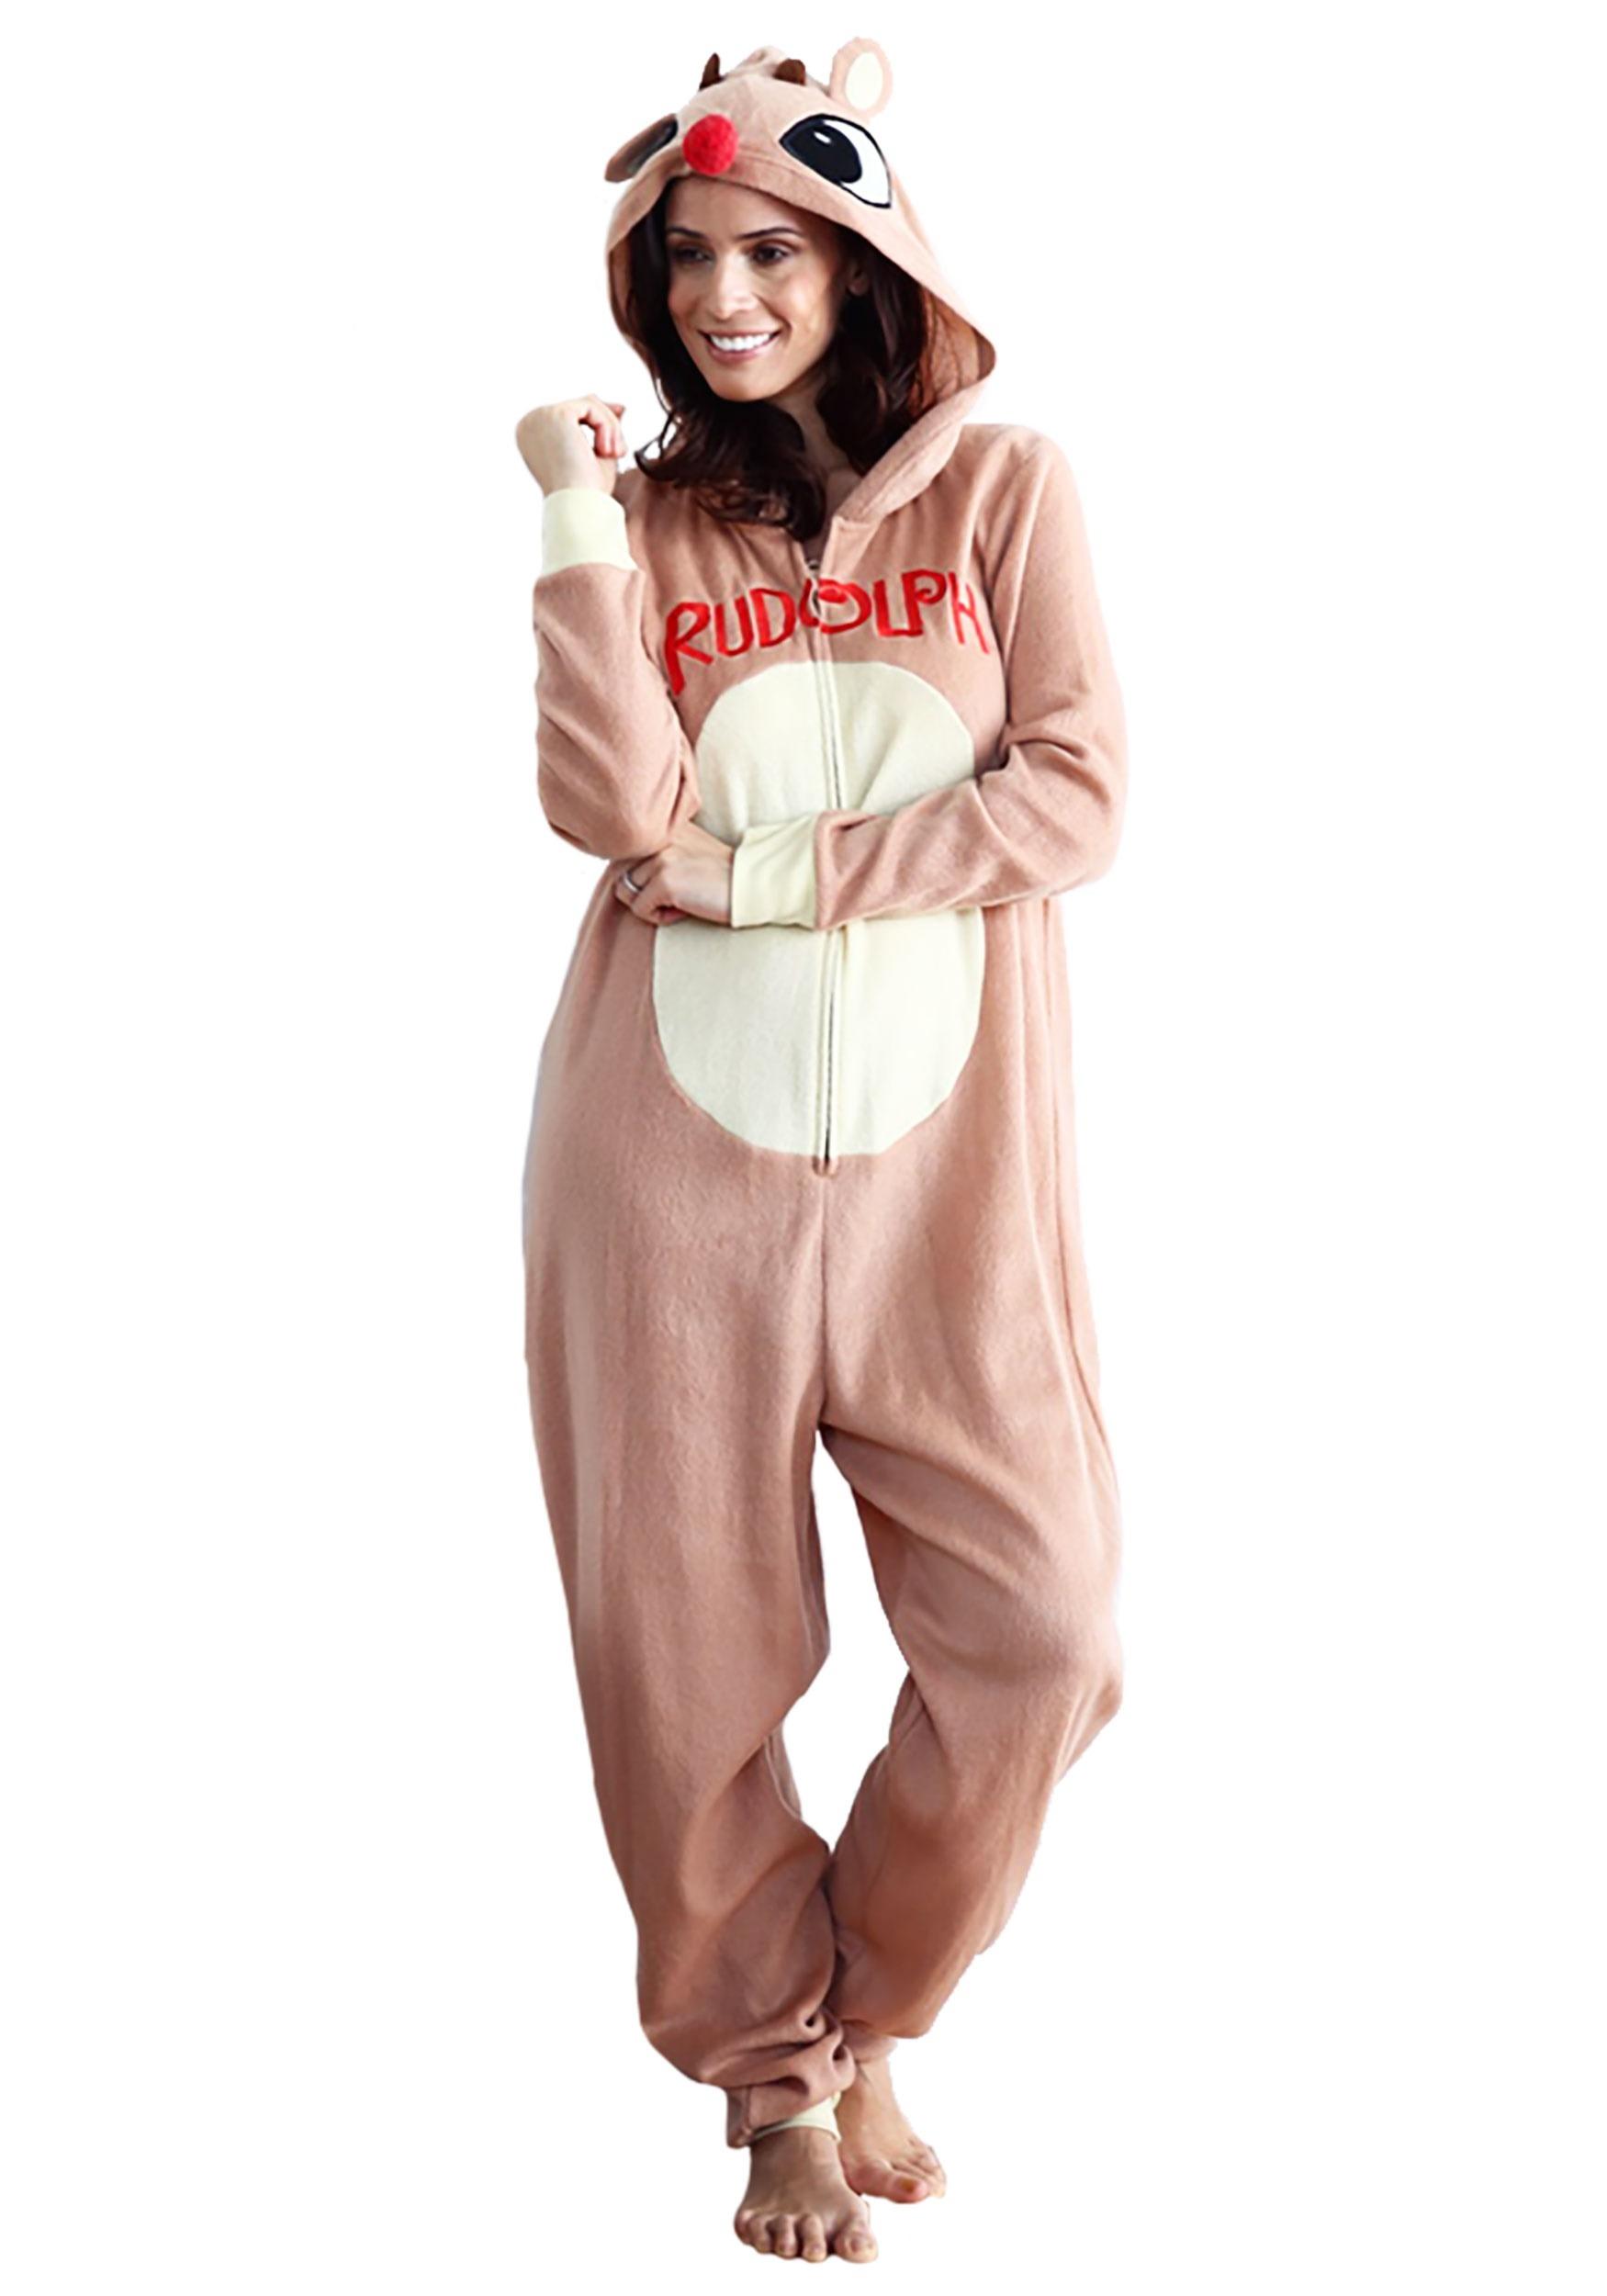 Rudolph Pajama Onesie or Women